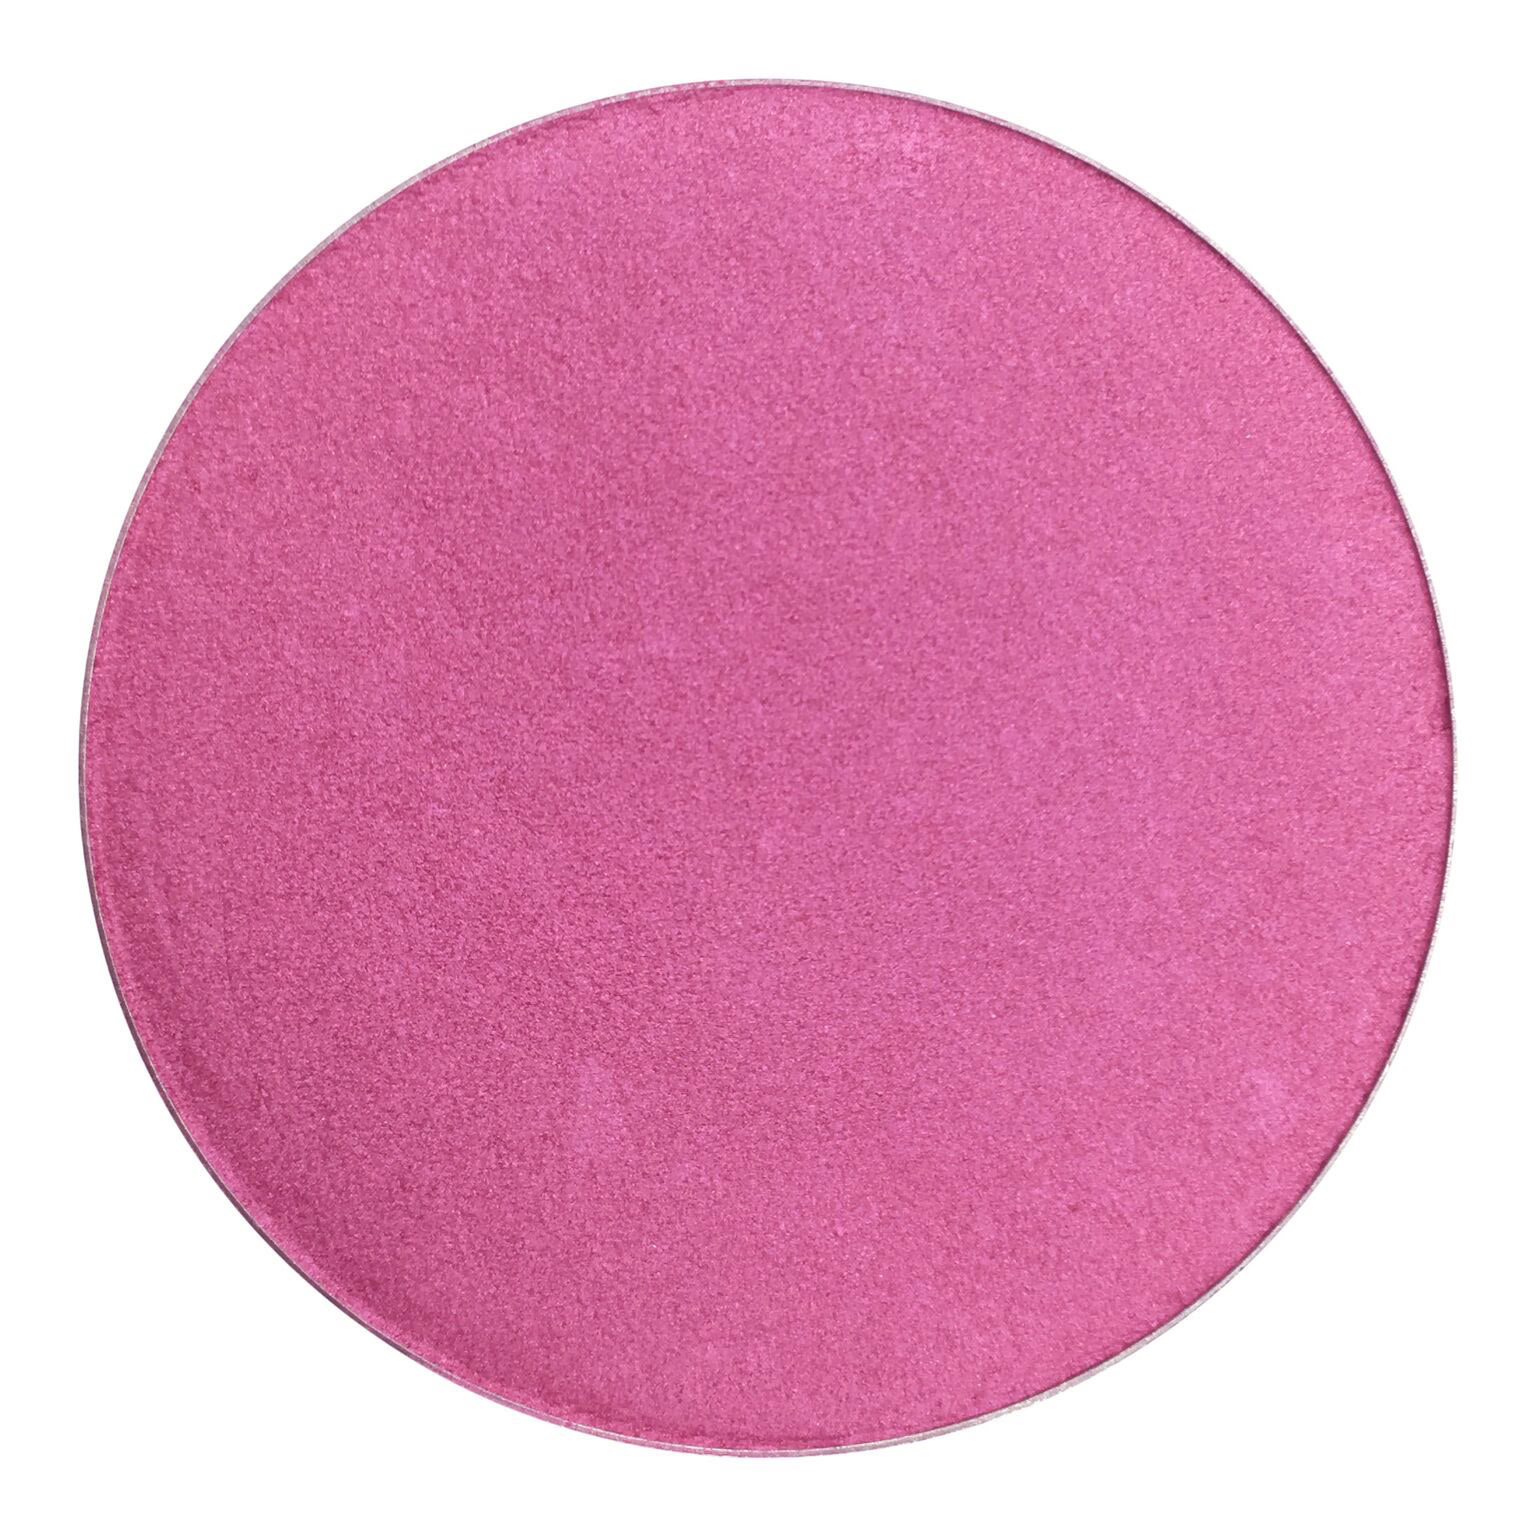 Strawberry Field Pressed Blush-1